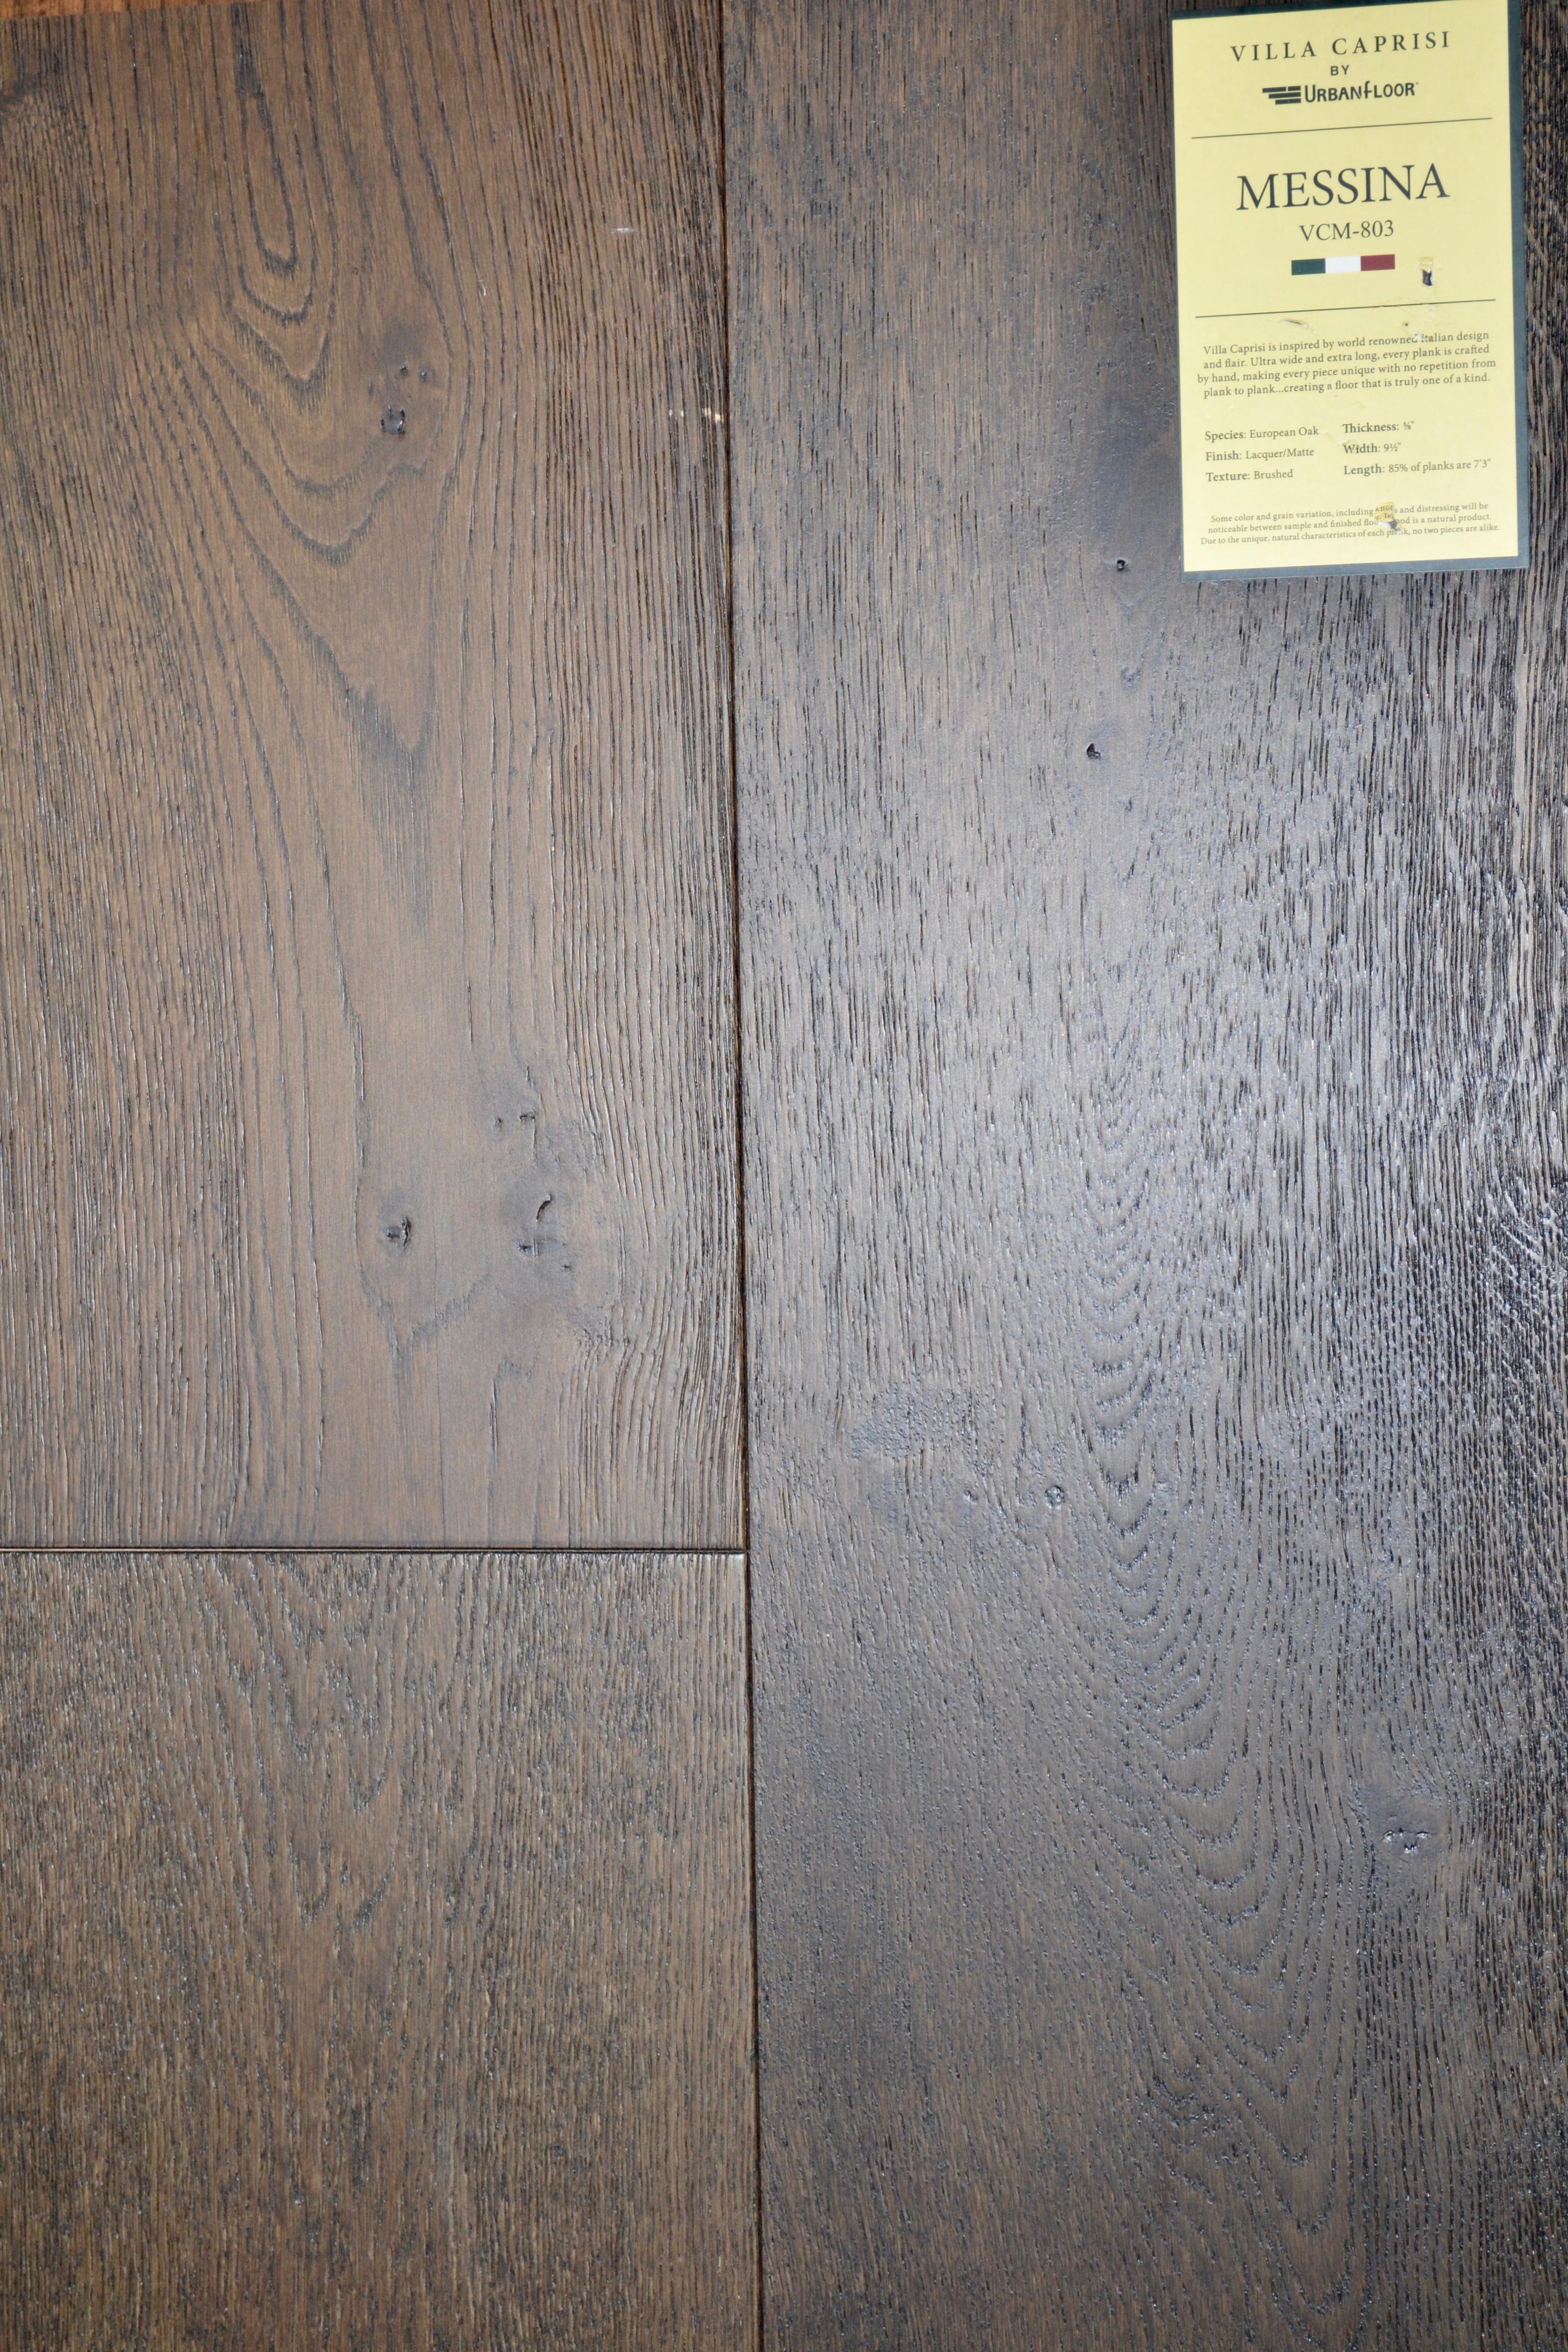 laminate flooring vs hardwood durability of villa caprisi fine european hardwood millennium hardwood with european style inspired designer oak floor messina by villa caprisi